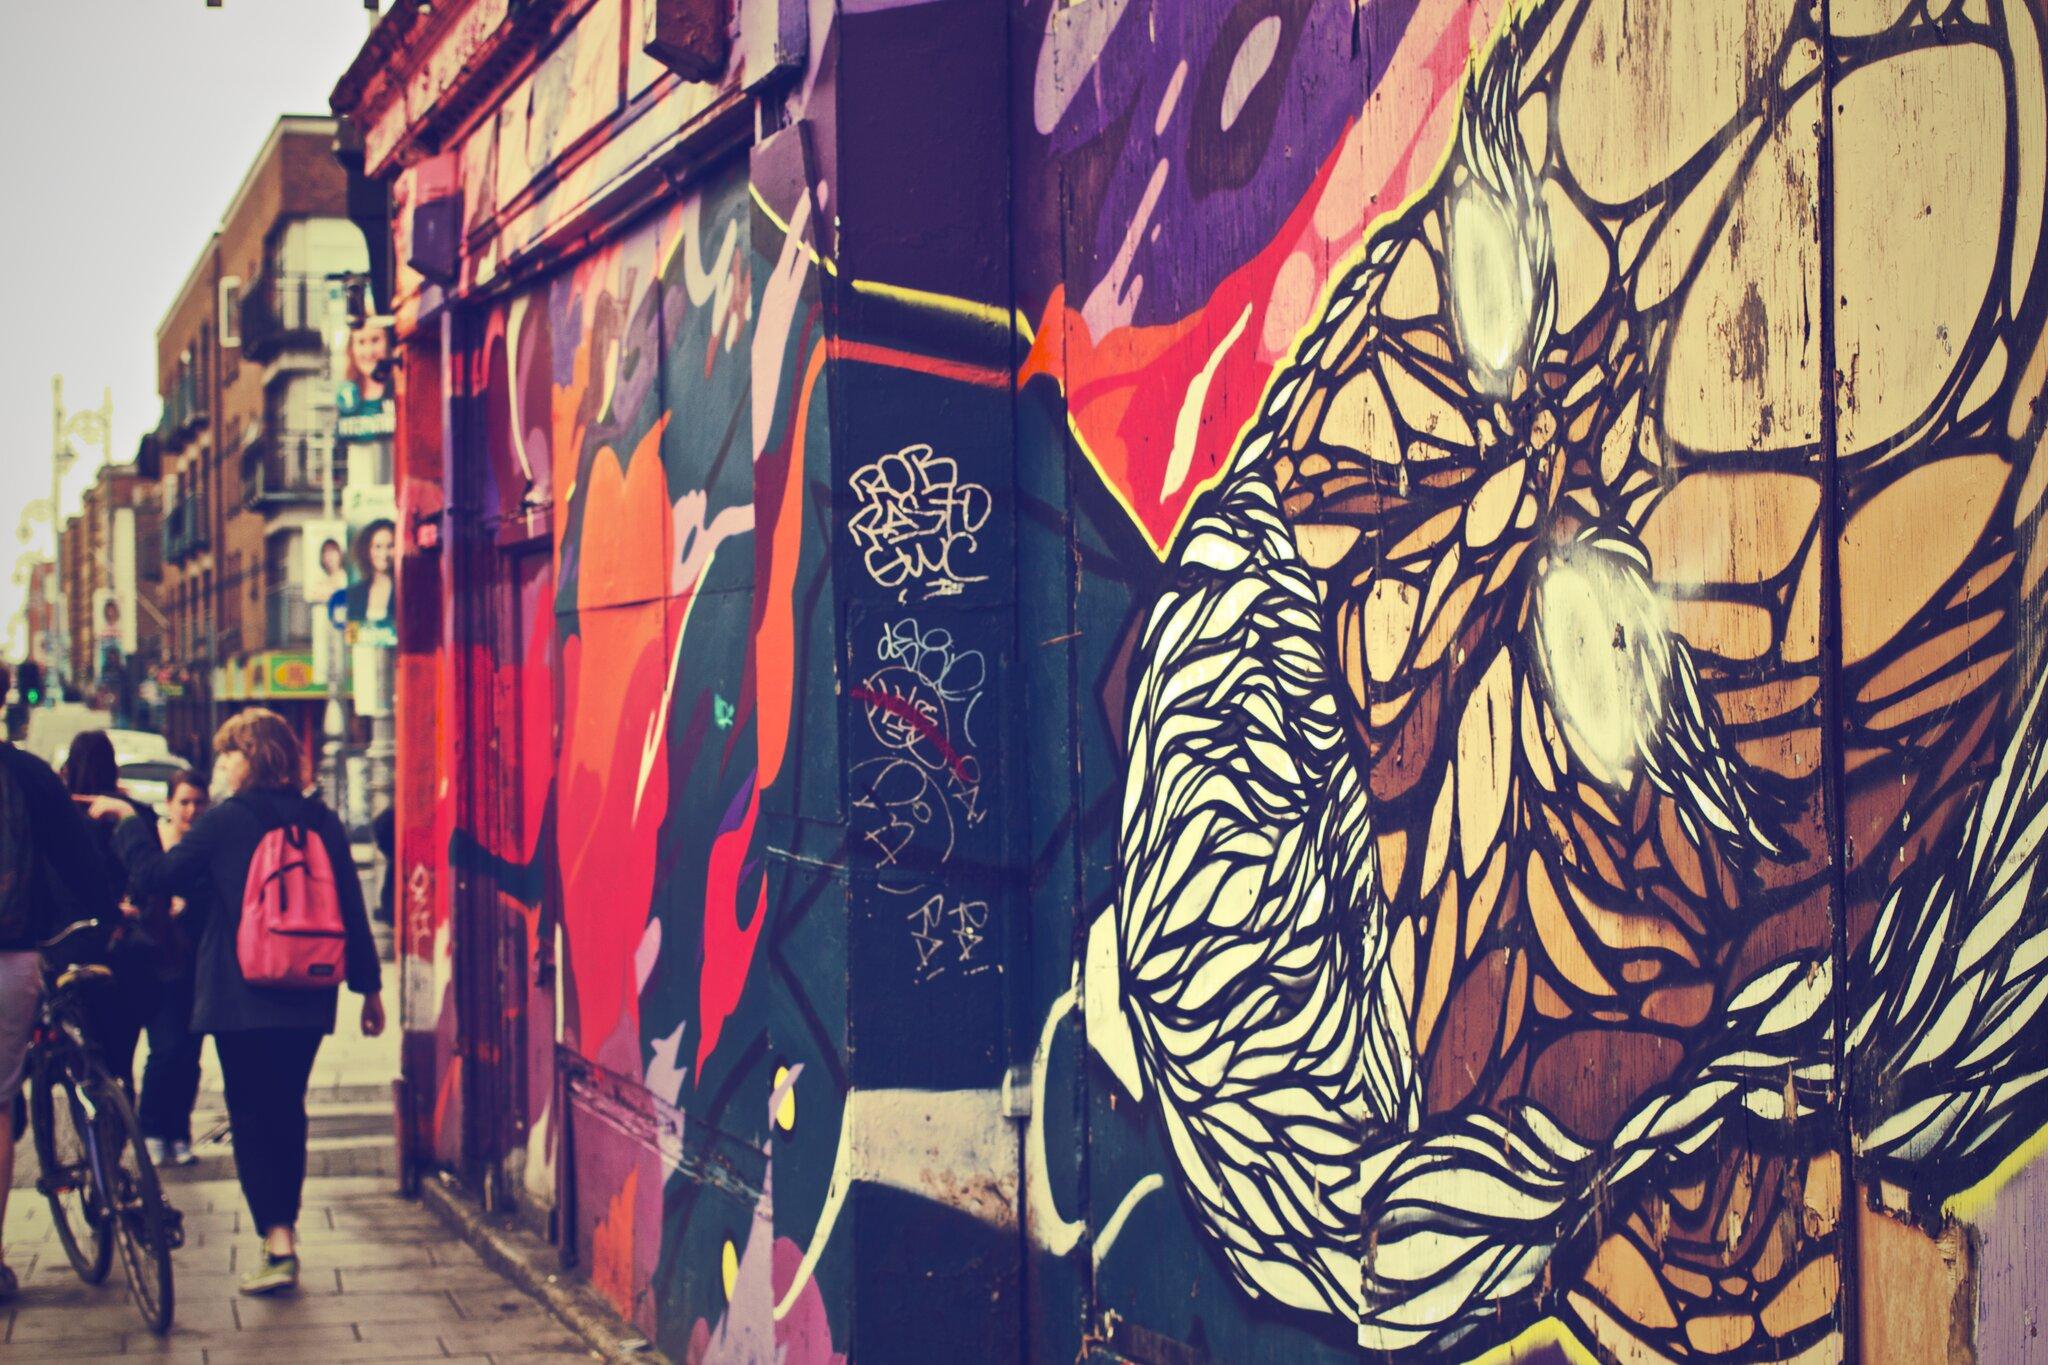 Uliczne graffiti Źródło: pexels, Uliczne graffiti, licencja: CC 0.